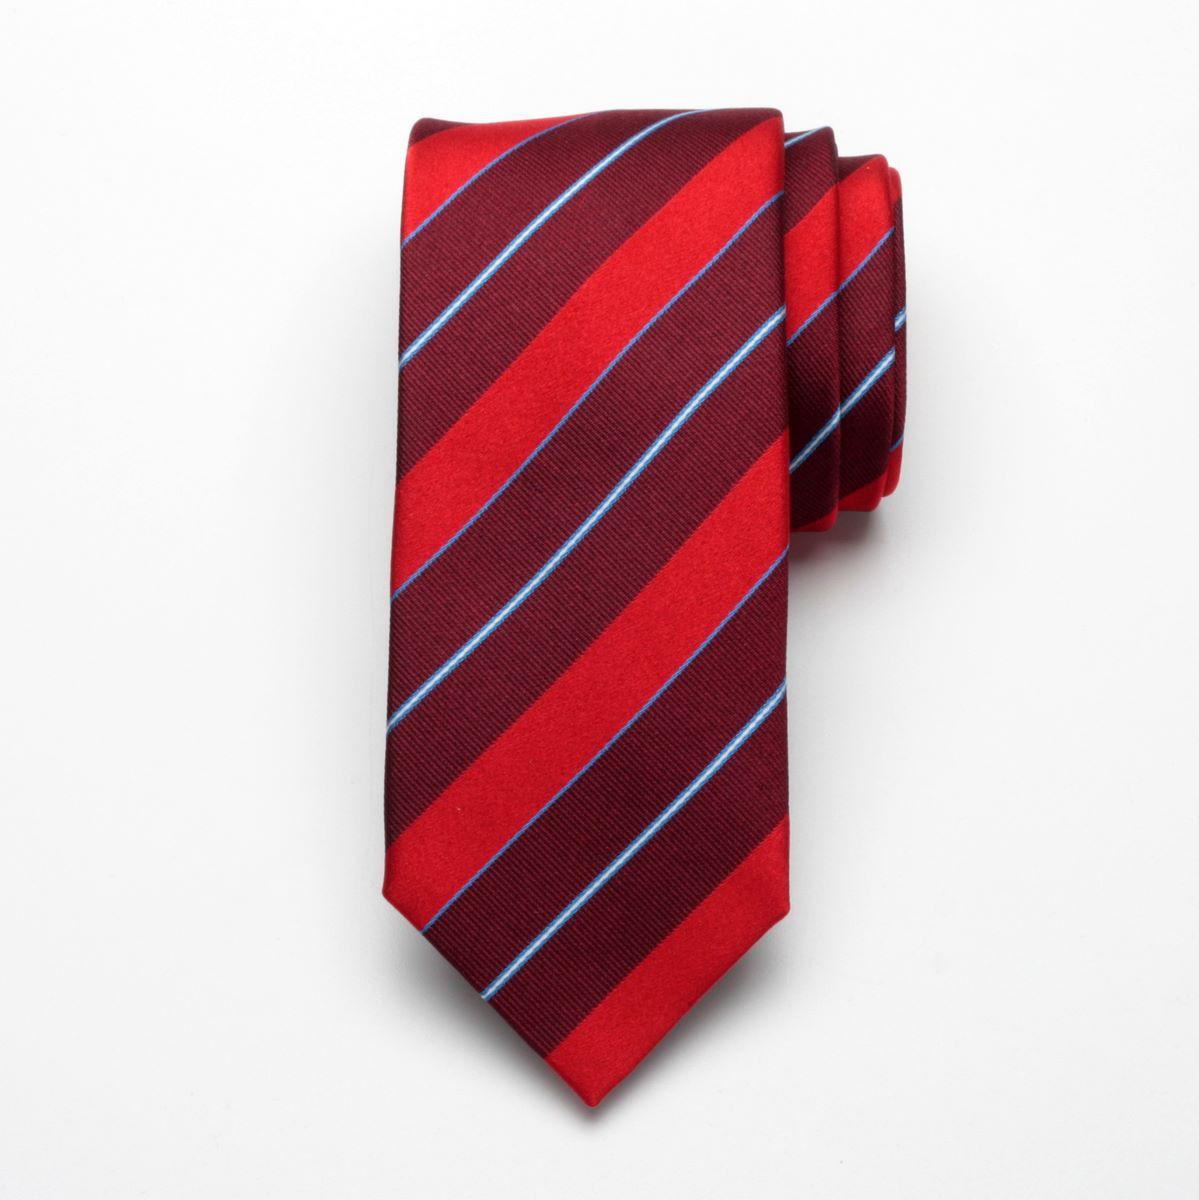 Krawat jedwabny Fine Selection (wzór 46)